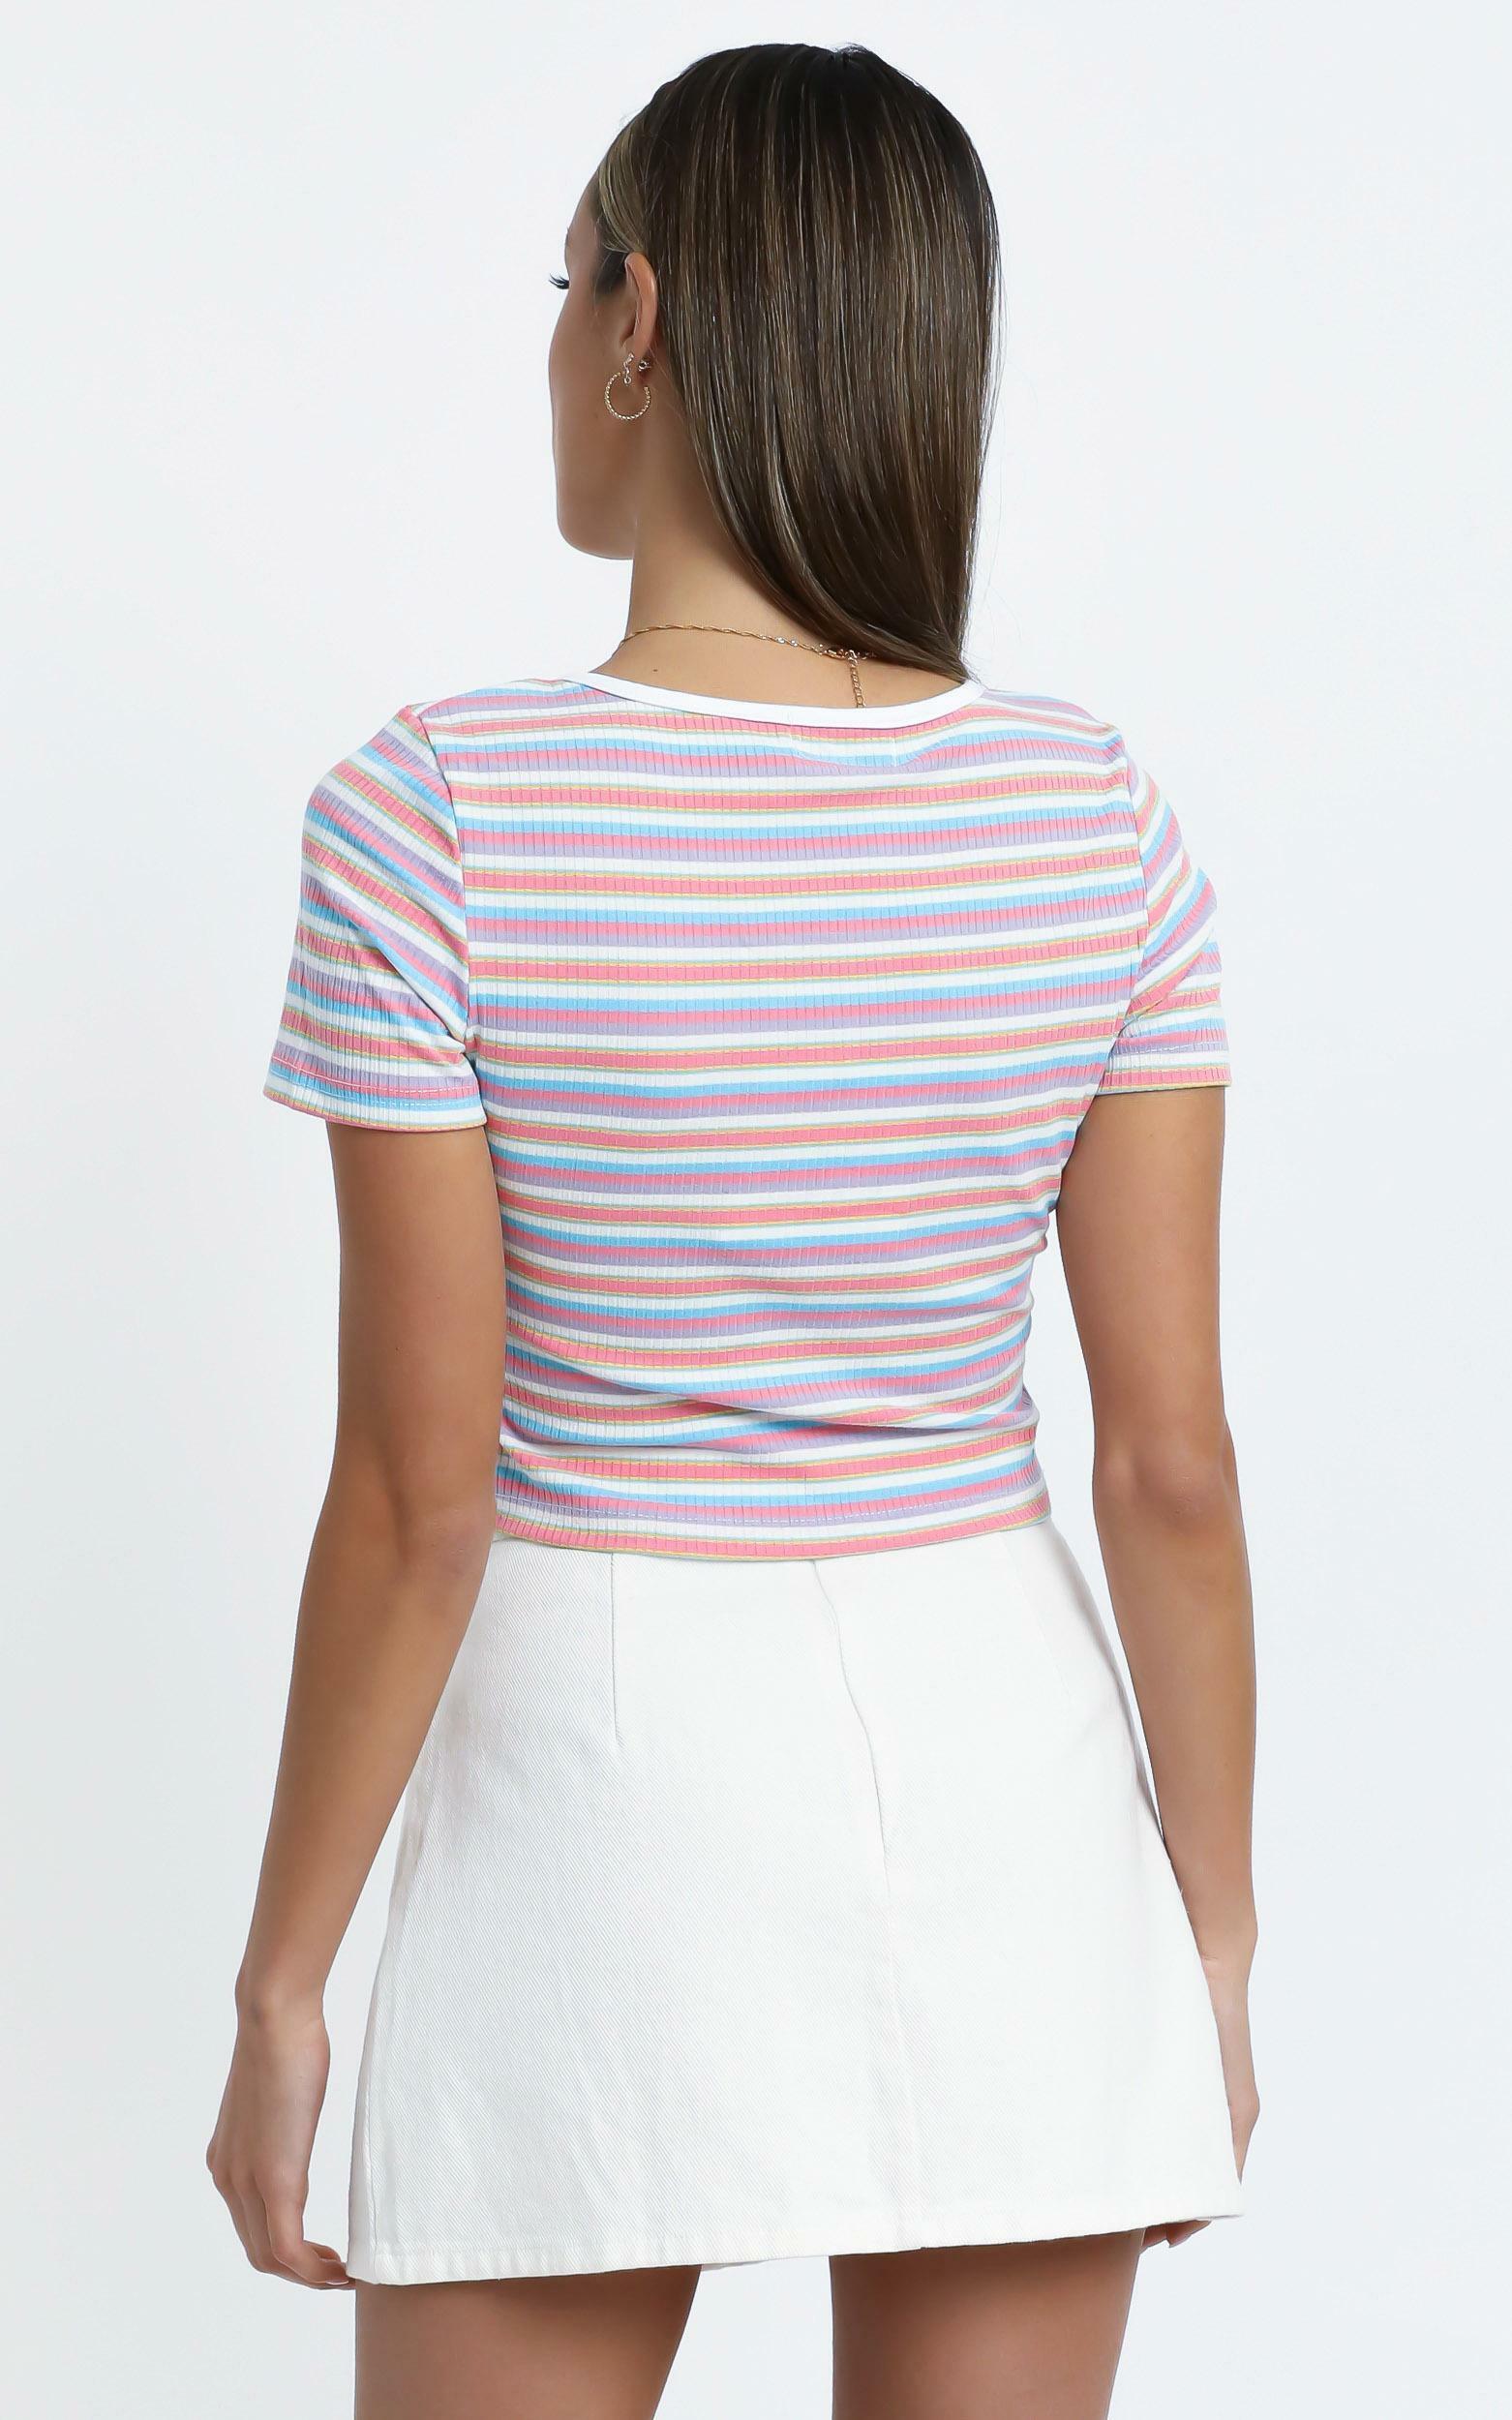 Tara Top in Red Stripe - L, Blush, hi-res image number null